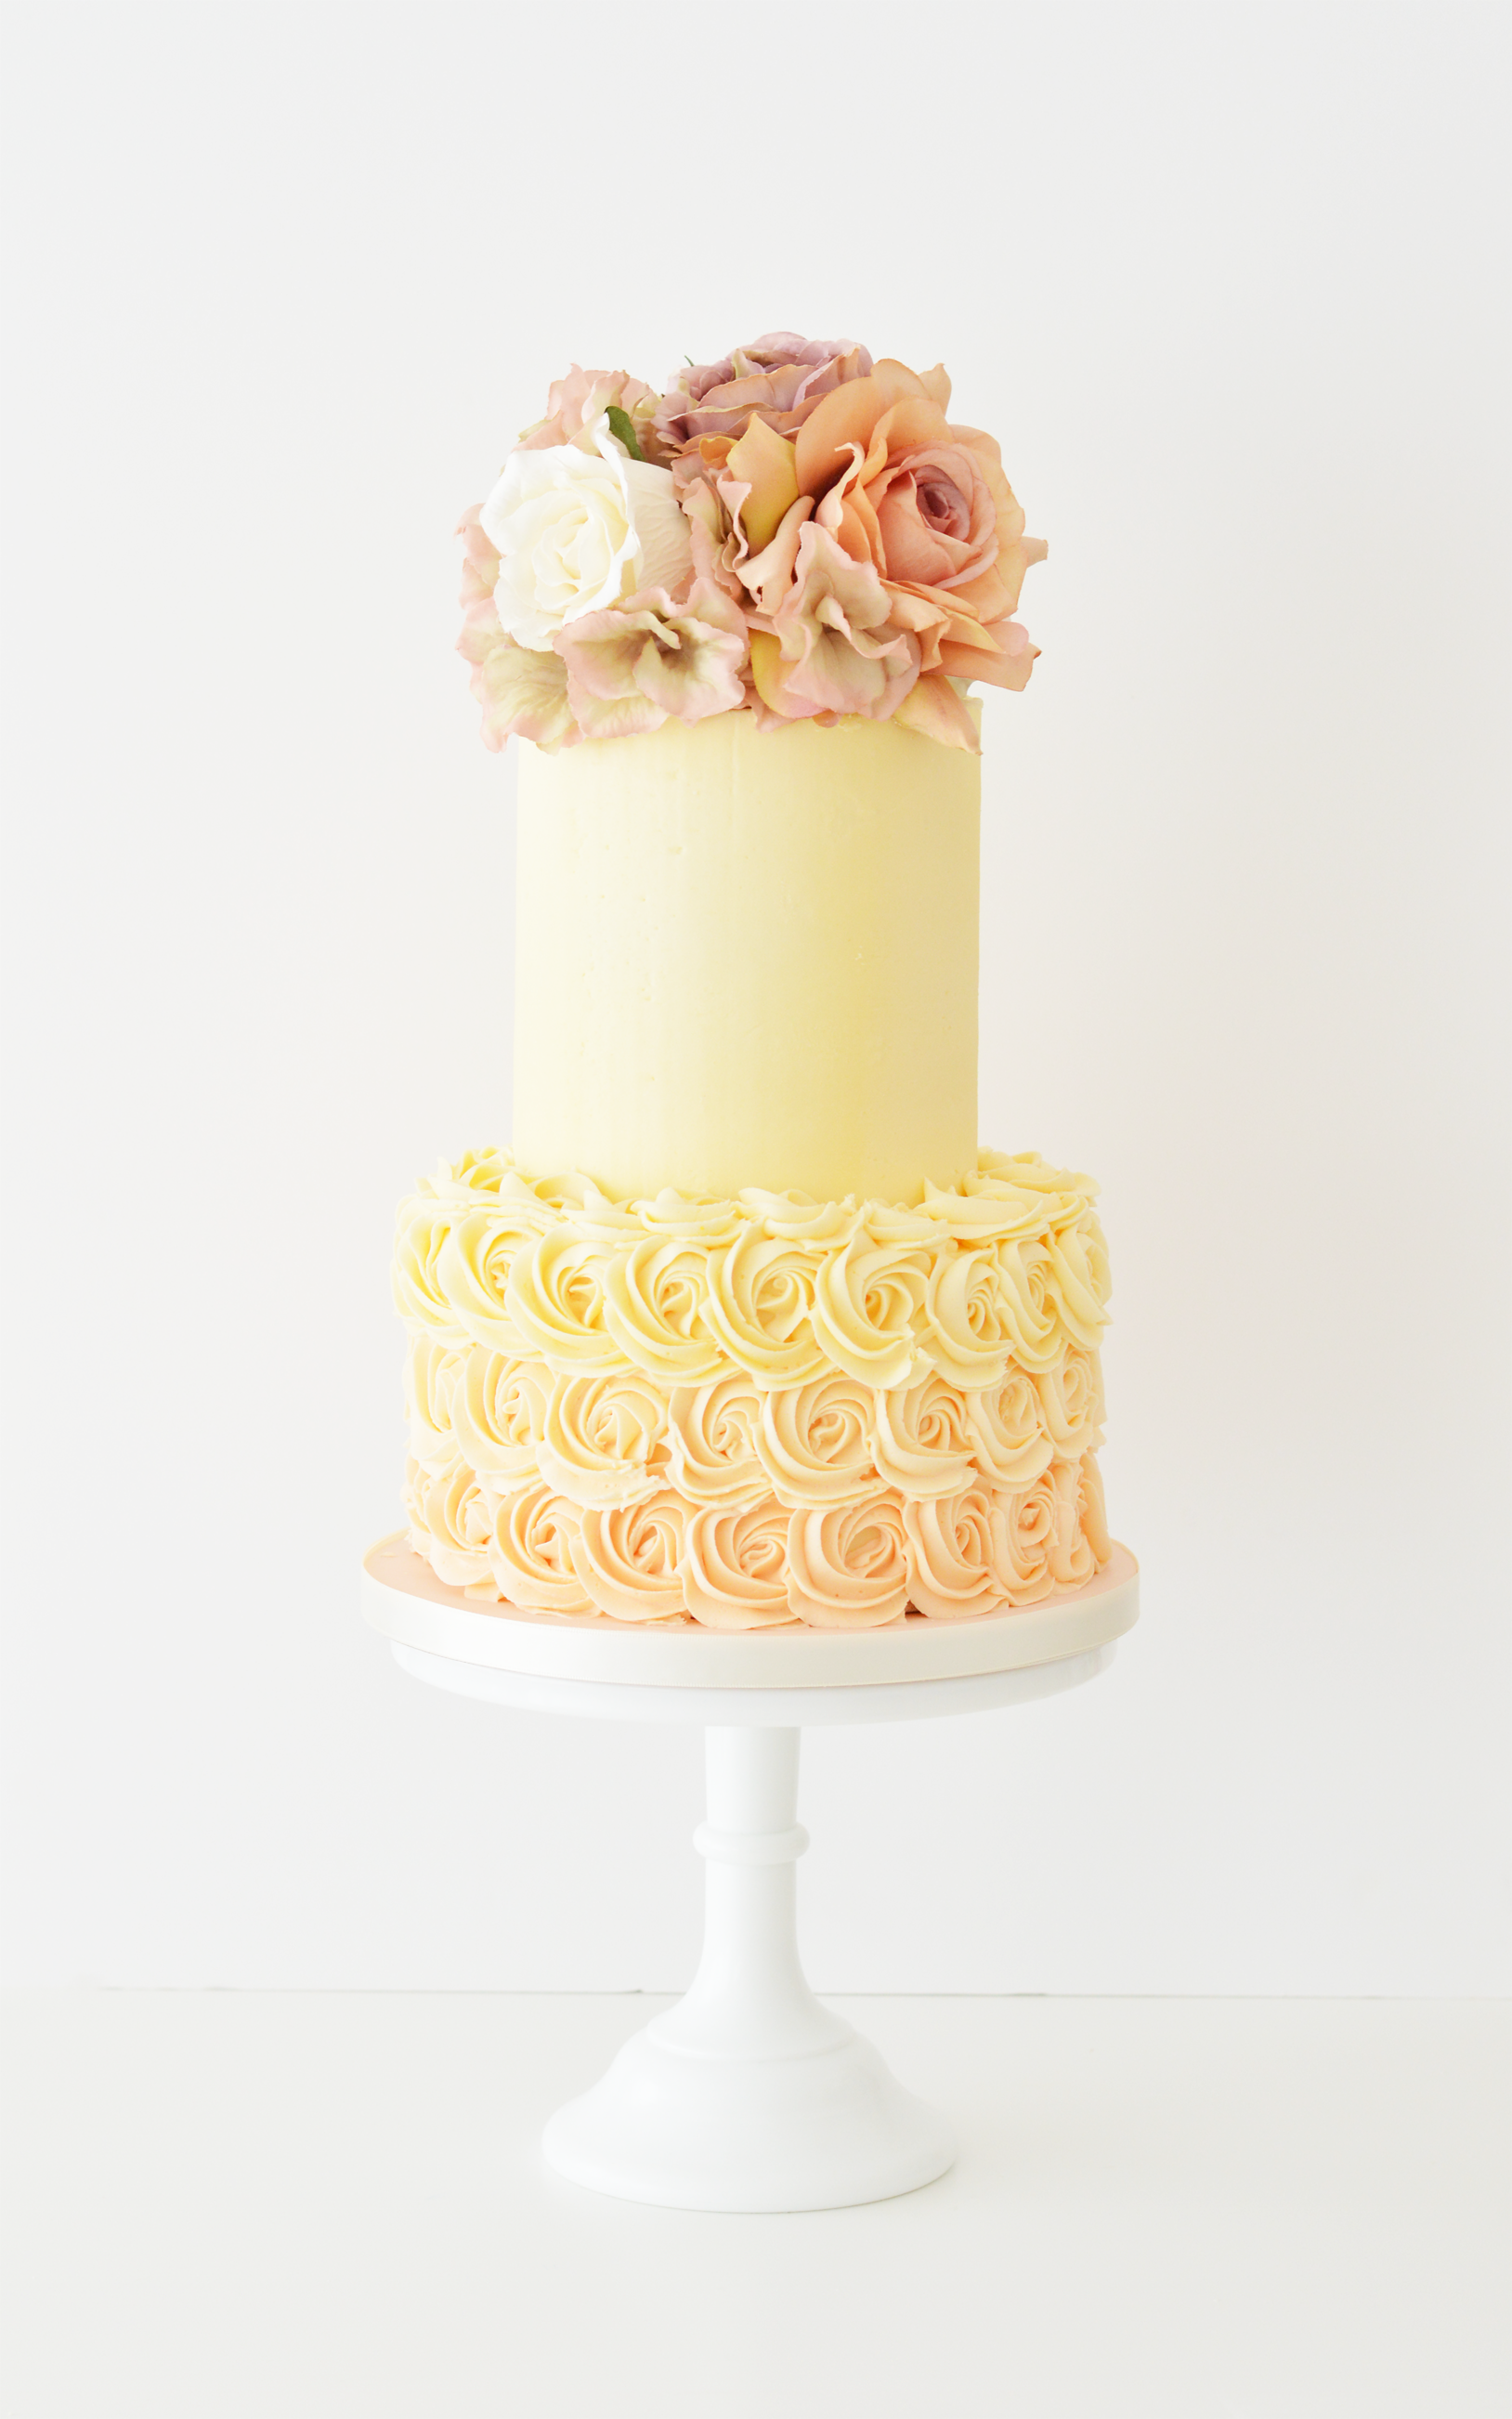 Buttercream-ombre-cake-swirls-for-Paula.png